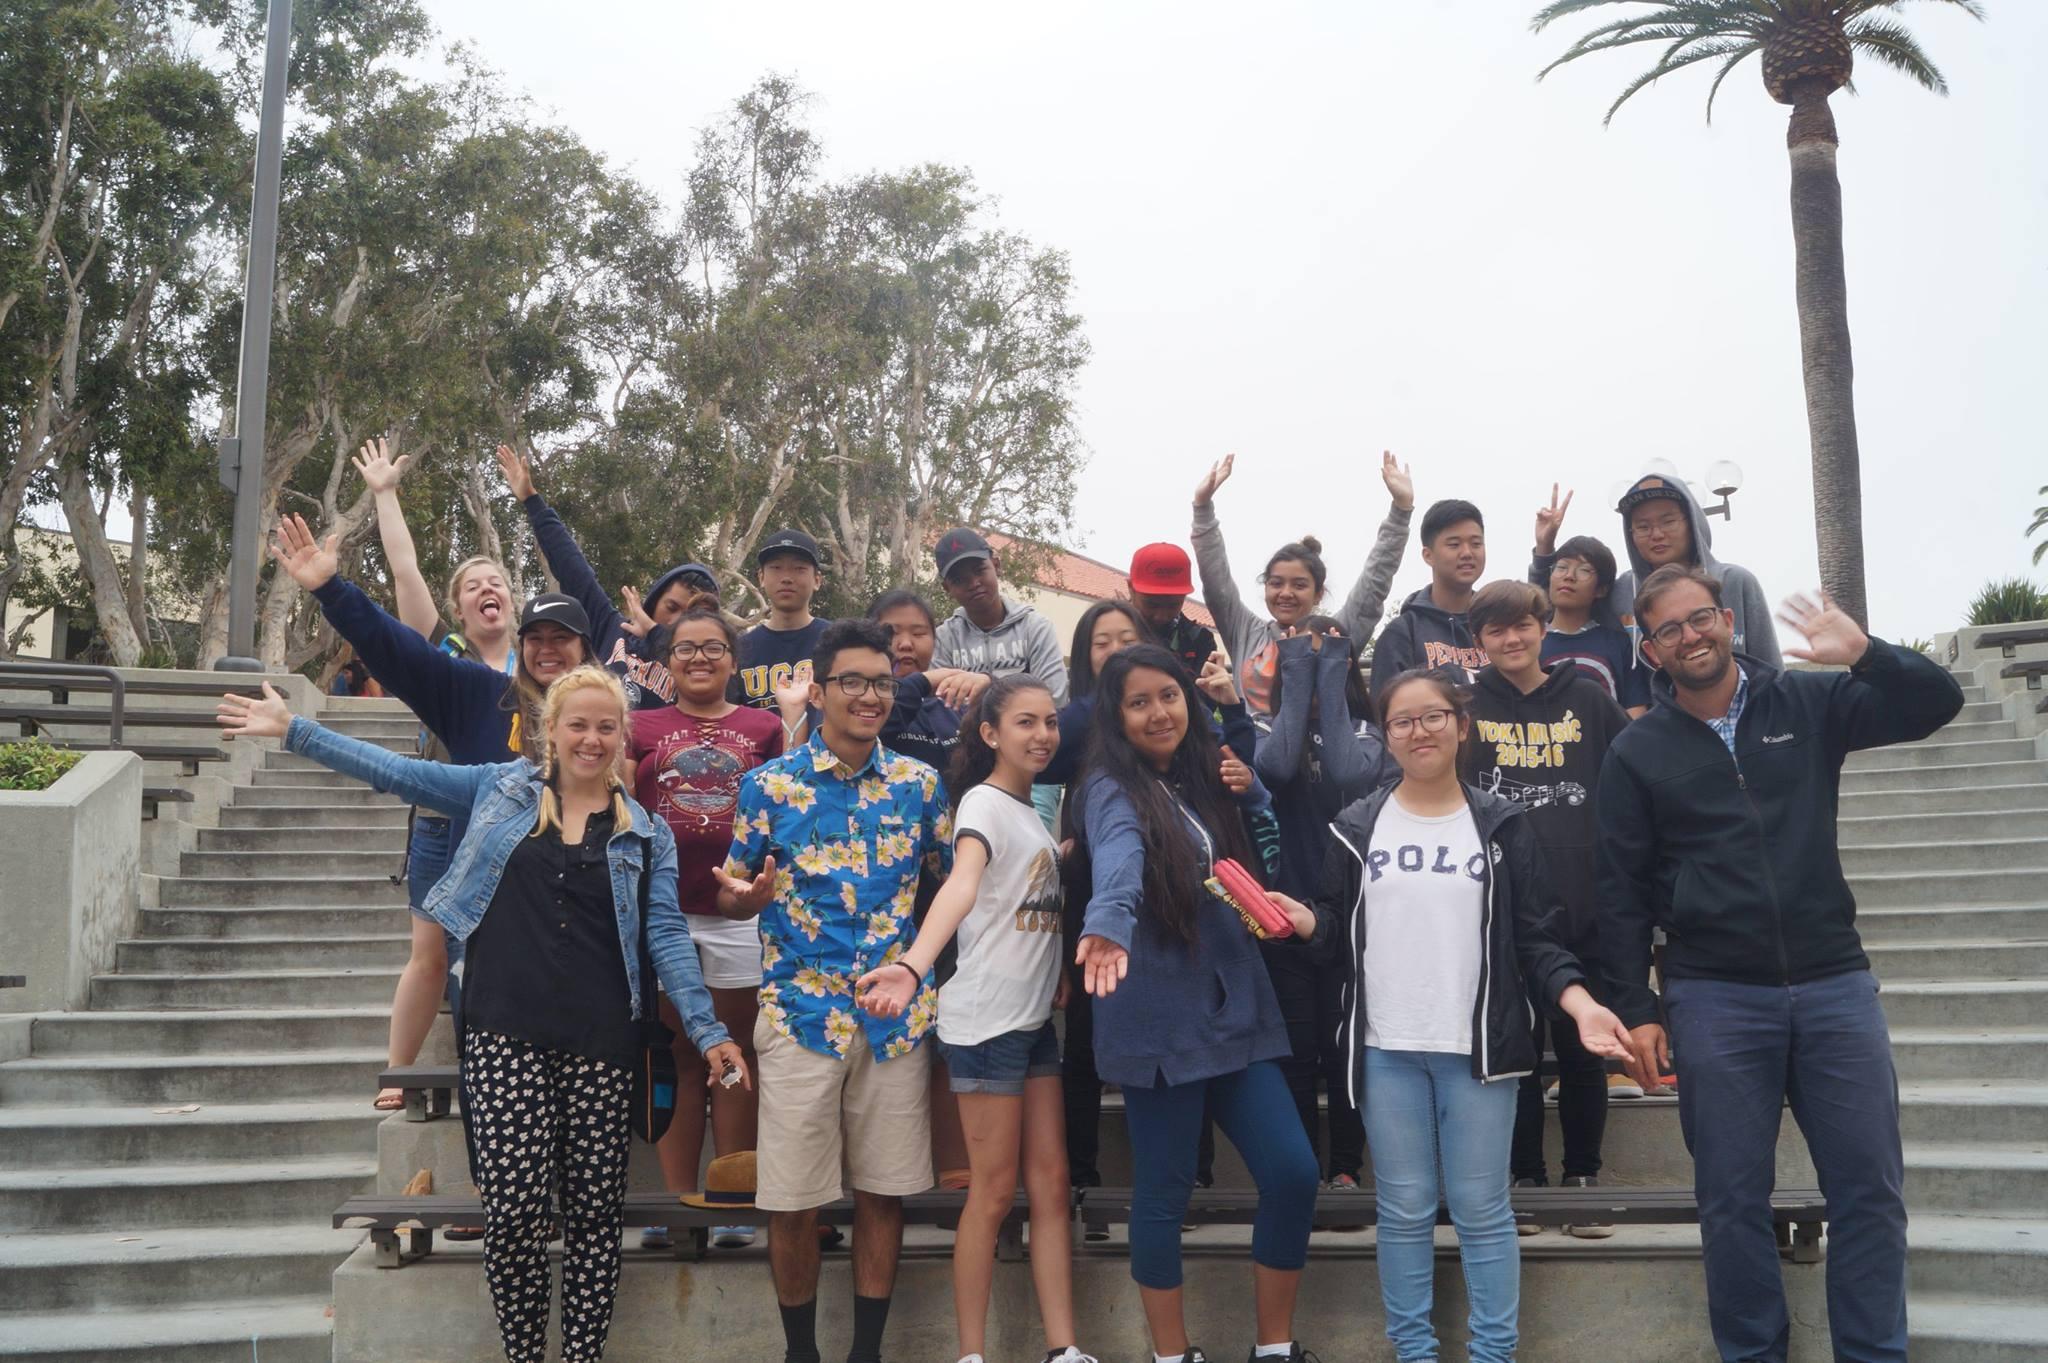 RKHS students on field trip